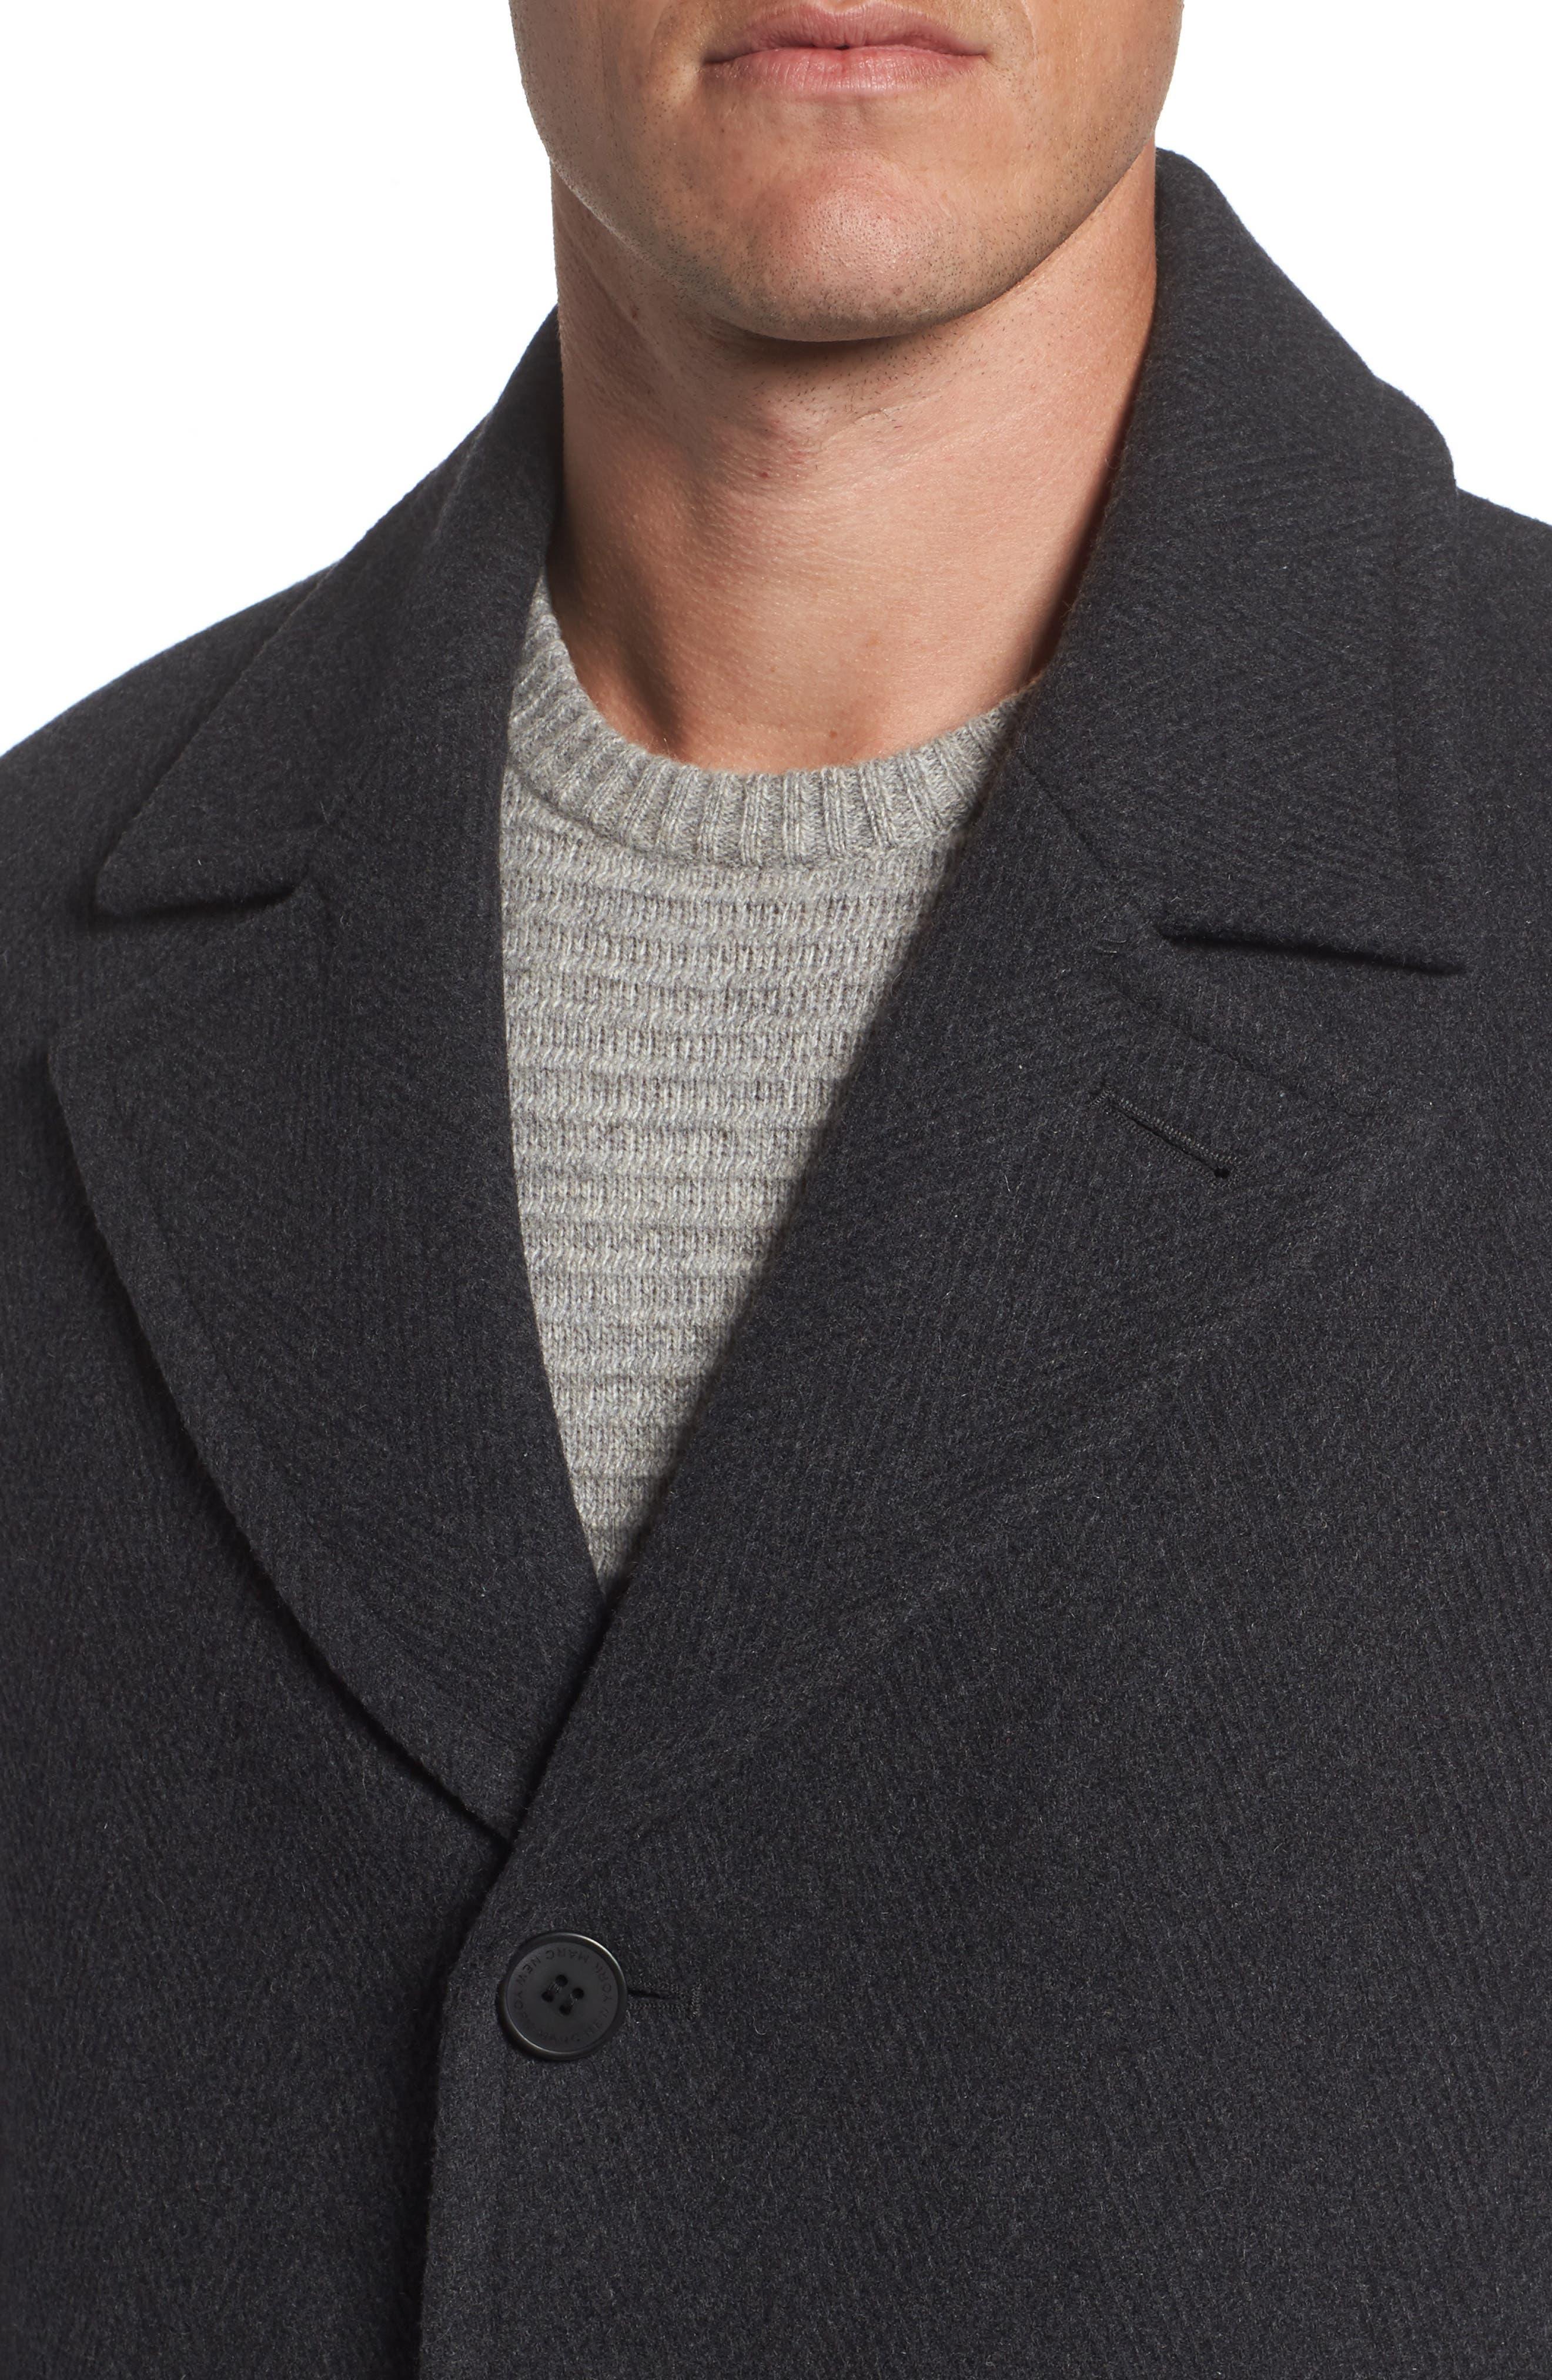 Herringbone Wool Blend Car Coat,                             Alternate thumbnail 7, color,